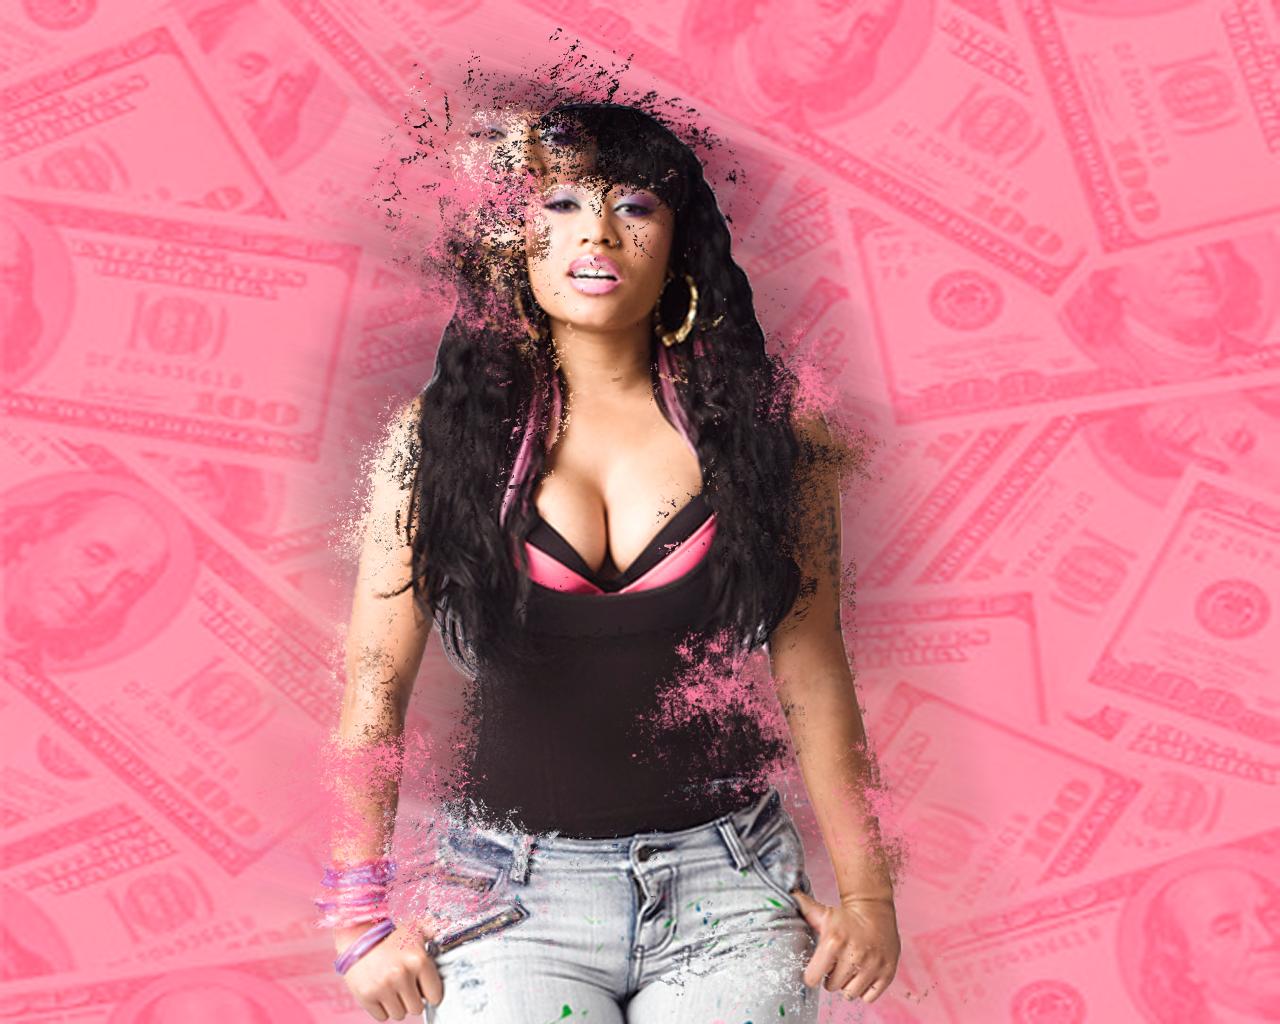 http://1.bp.blogspot.com/-_SaRxKQuTB8/UITYDG9wIxI/AAAAAAAAJc0/sN6WGkNonmY/s1600/Nicki-Minaj-wallpaper14.png